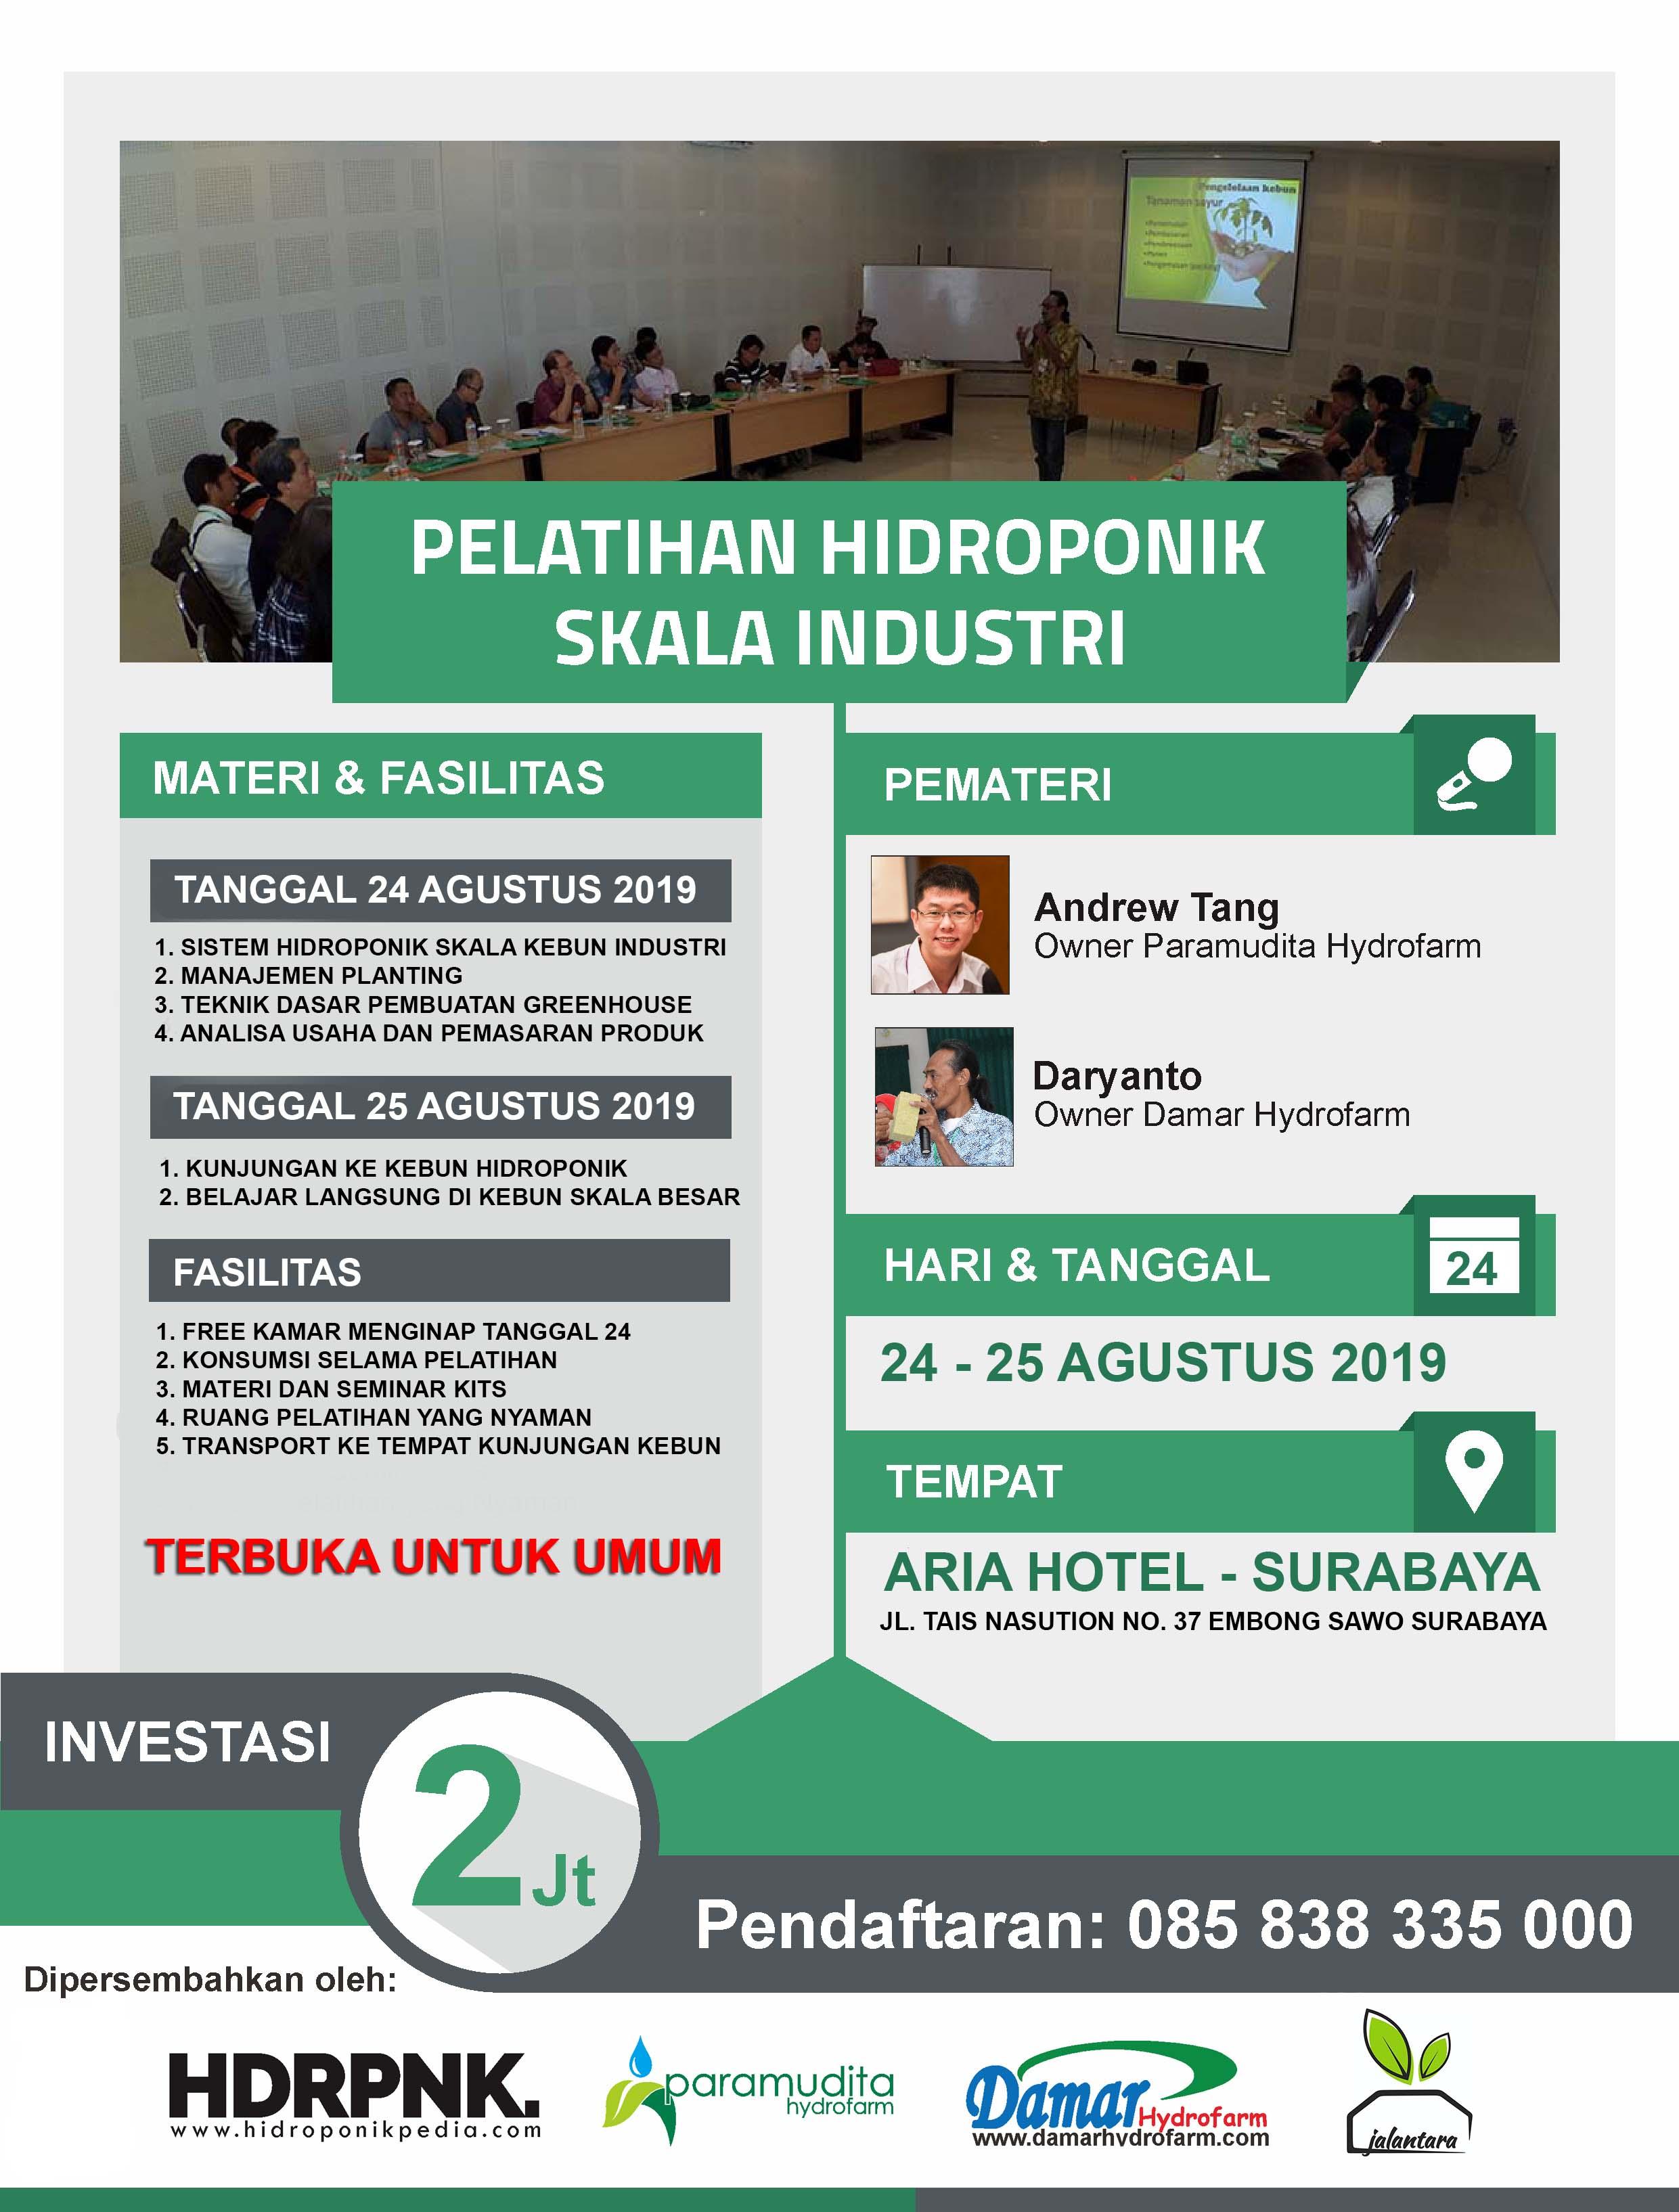 Pelatihan Hidroponik Skala Industri 24-25 Agustus 2019 (SURABAYA)